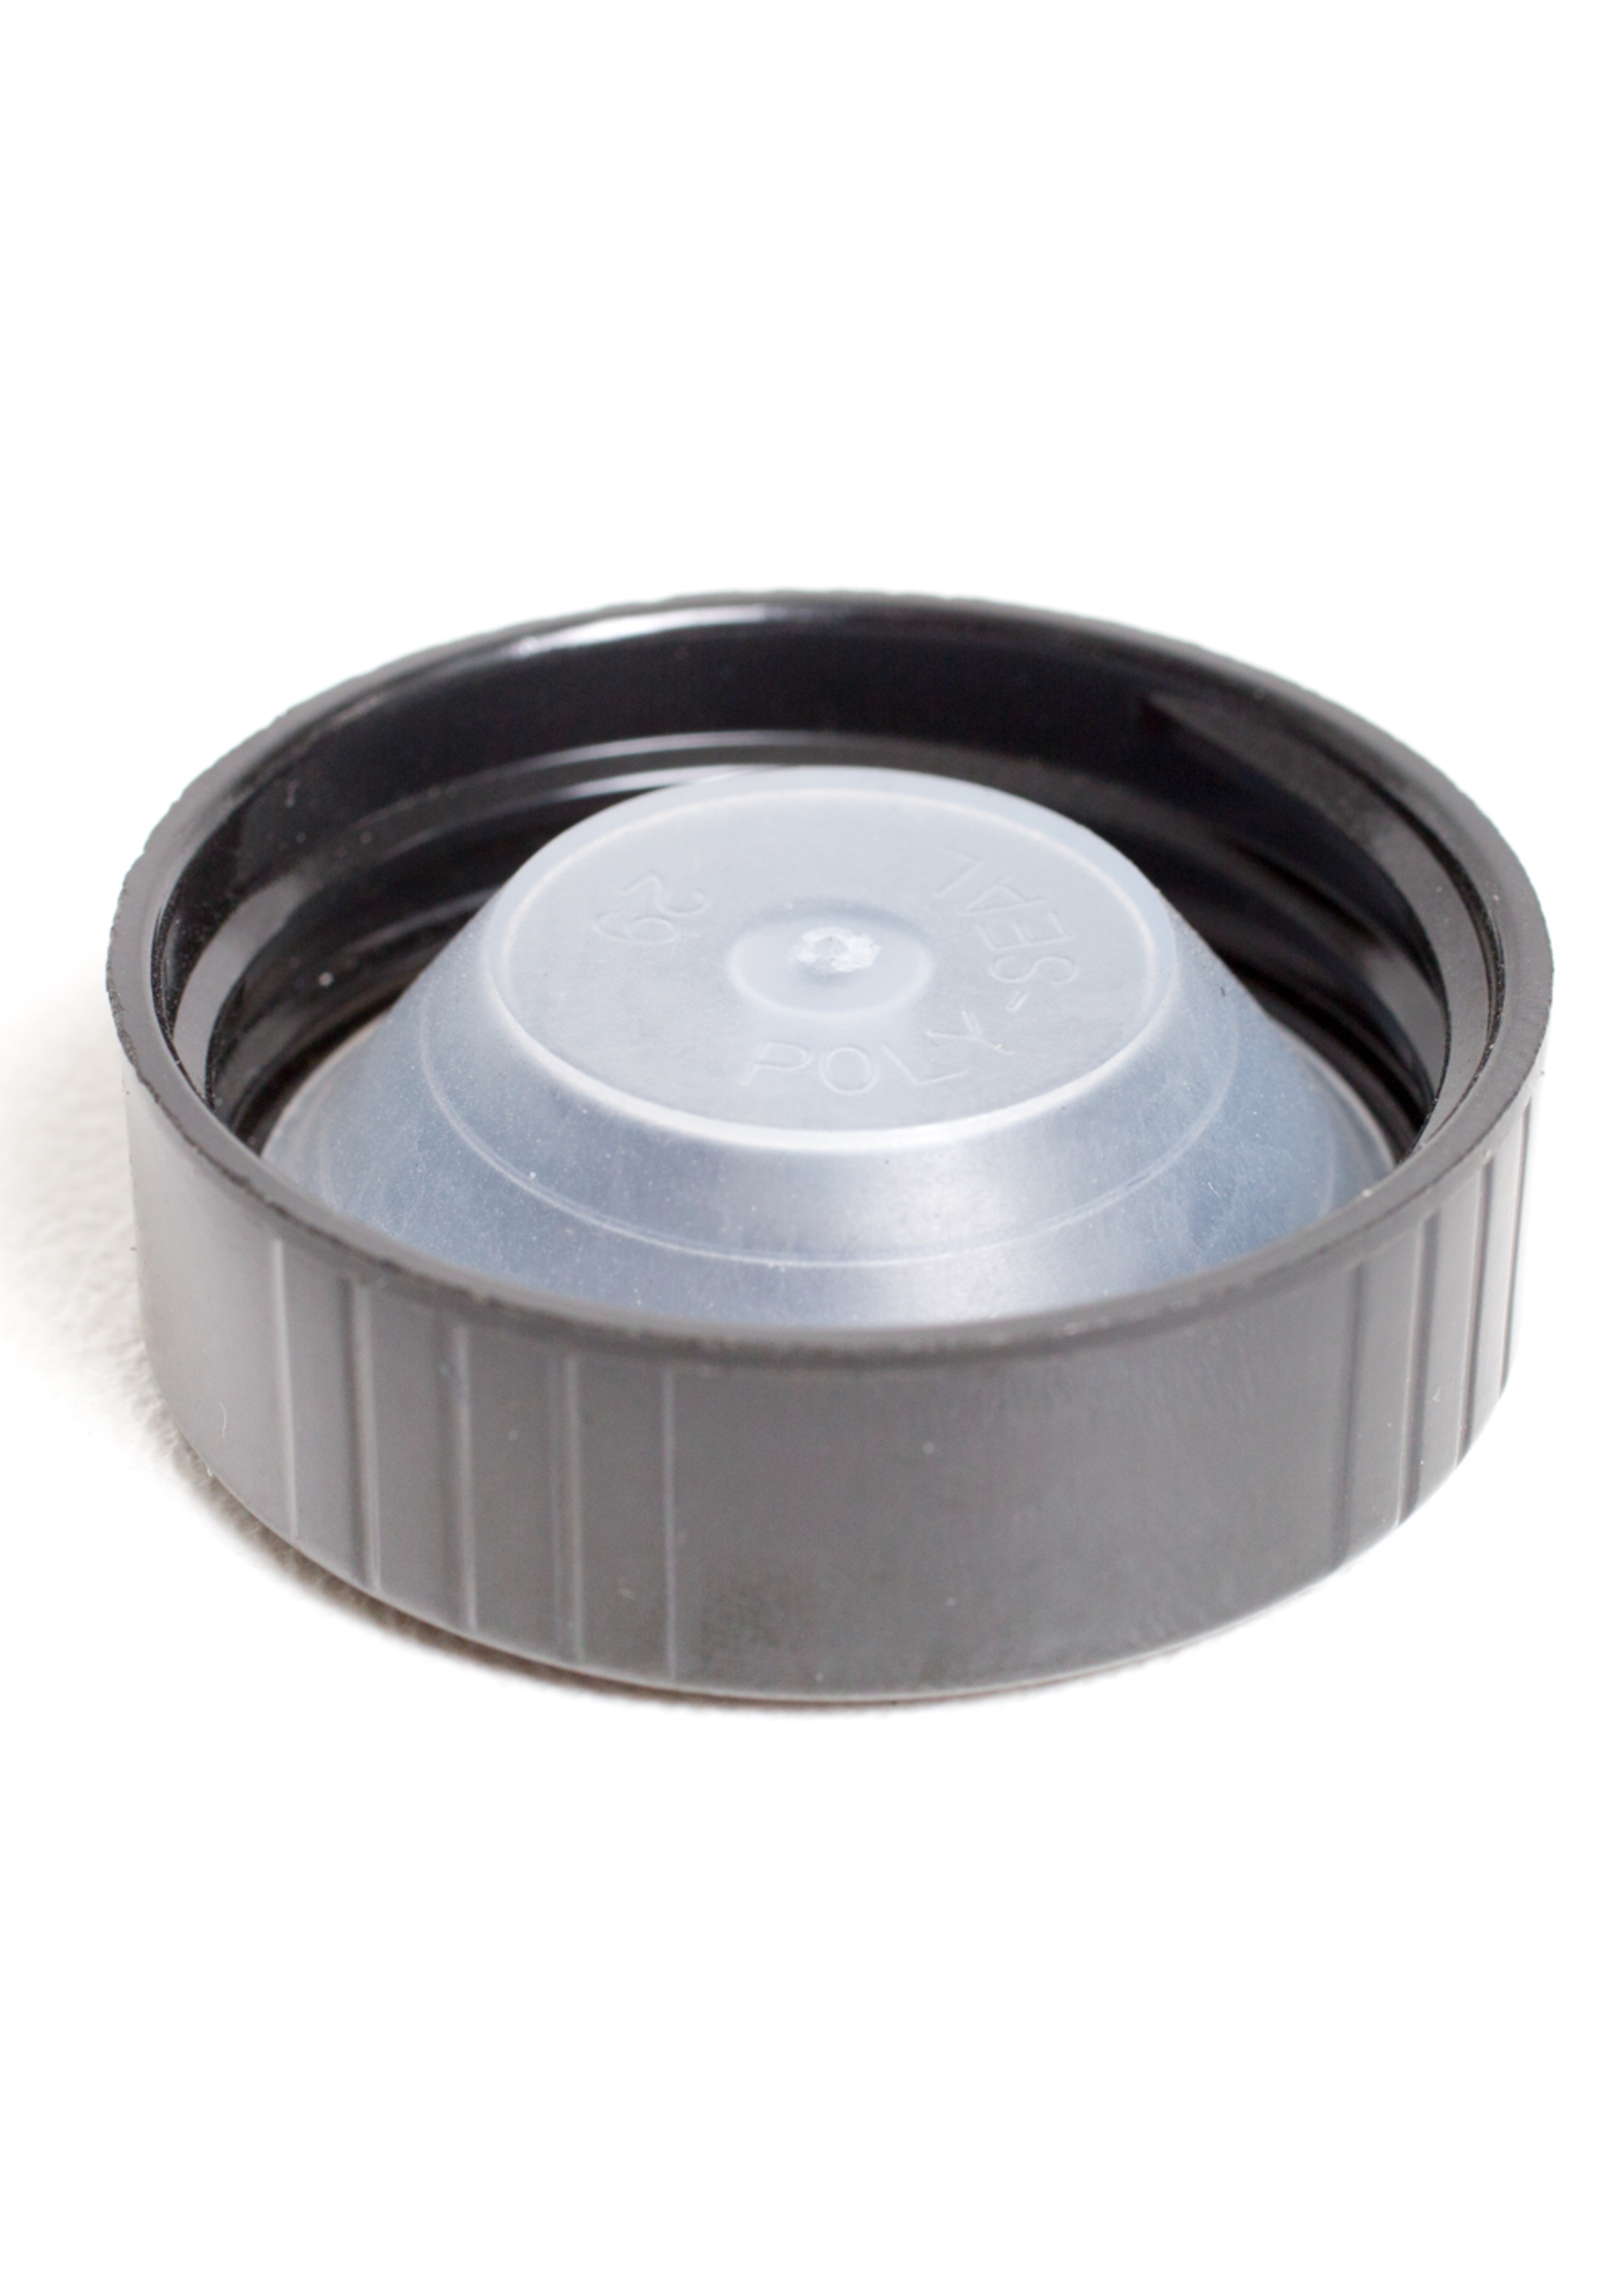 Racking/Bottling 38mm Polyseal Screw Cap for Growler or One Gallon Jug